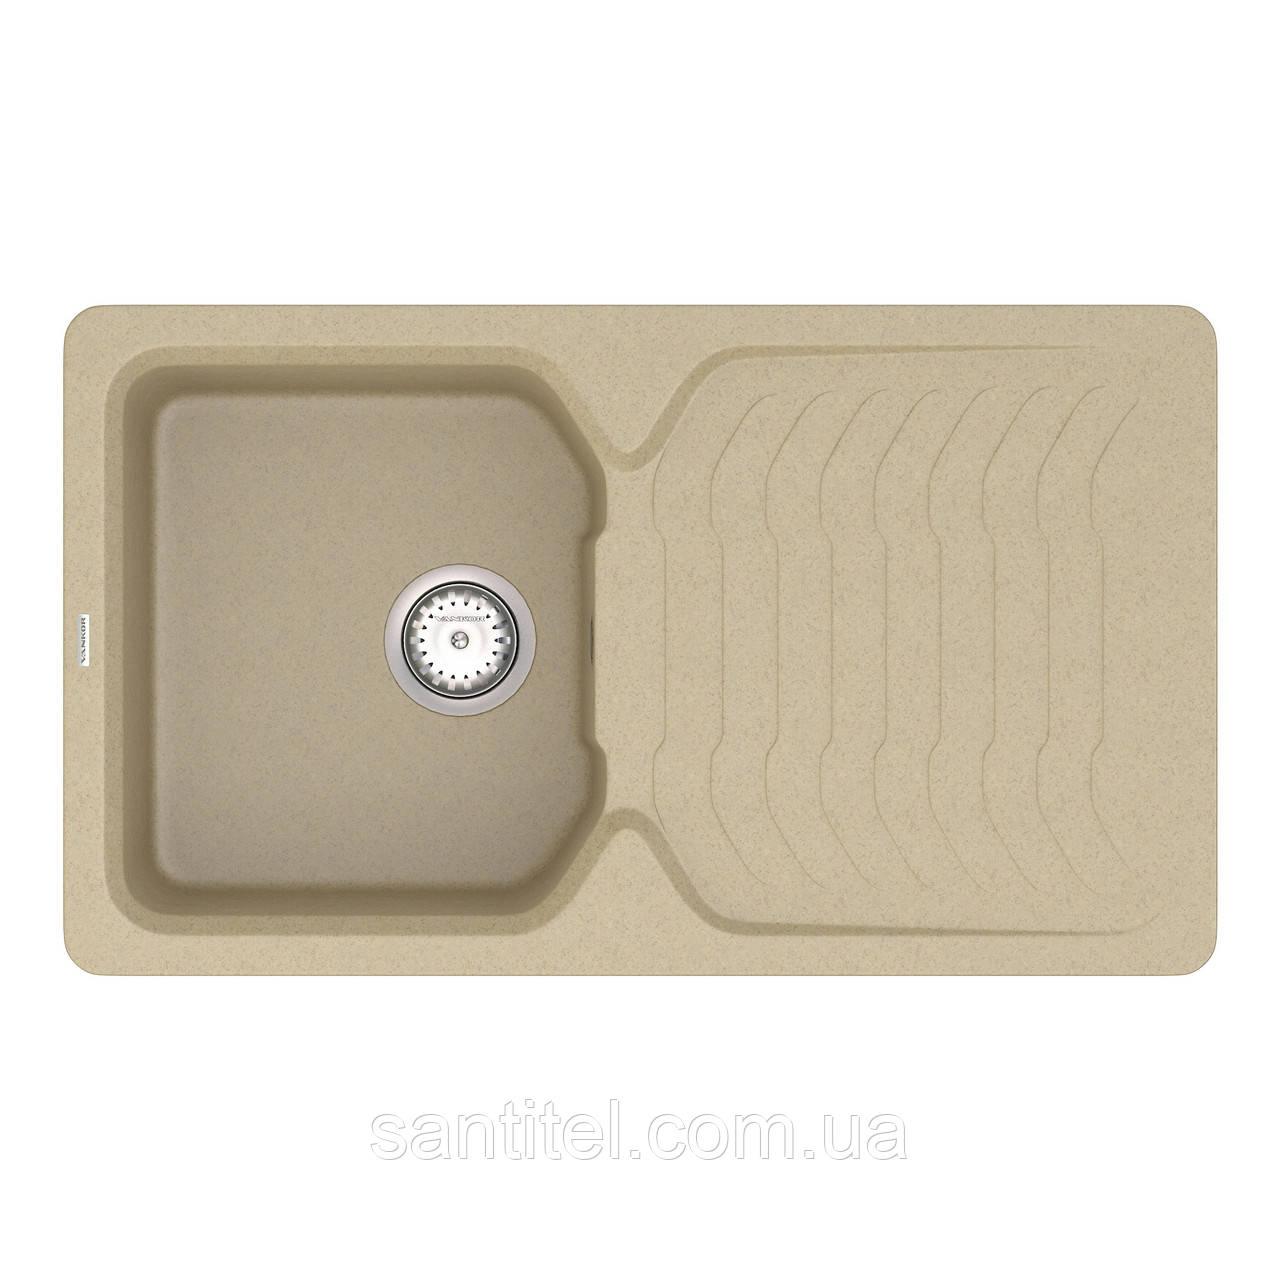 Кухонная мойка VANKOR Sigma SMP 02.85 Safari + сифон VANKOR